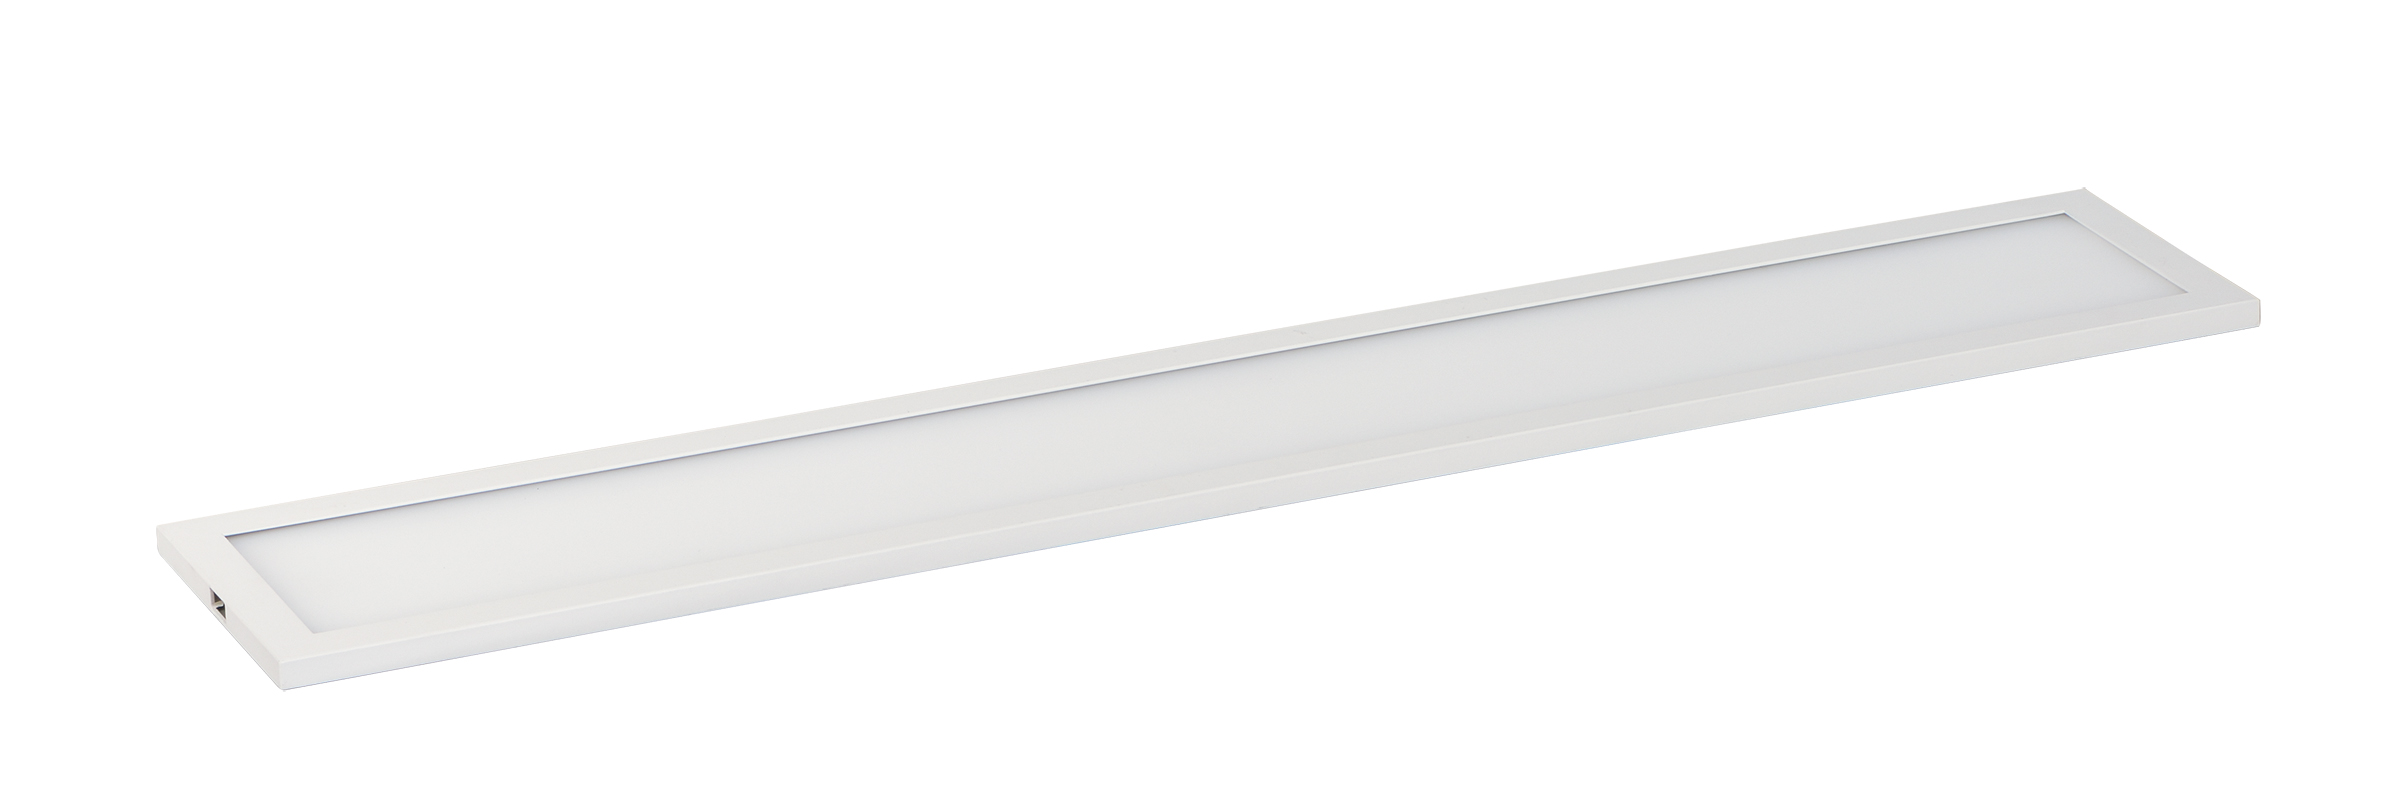 Wafer 4.5-inch x 24-inch LED Linear Flush Mount 4000K | Maxim Lighting